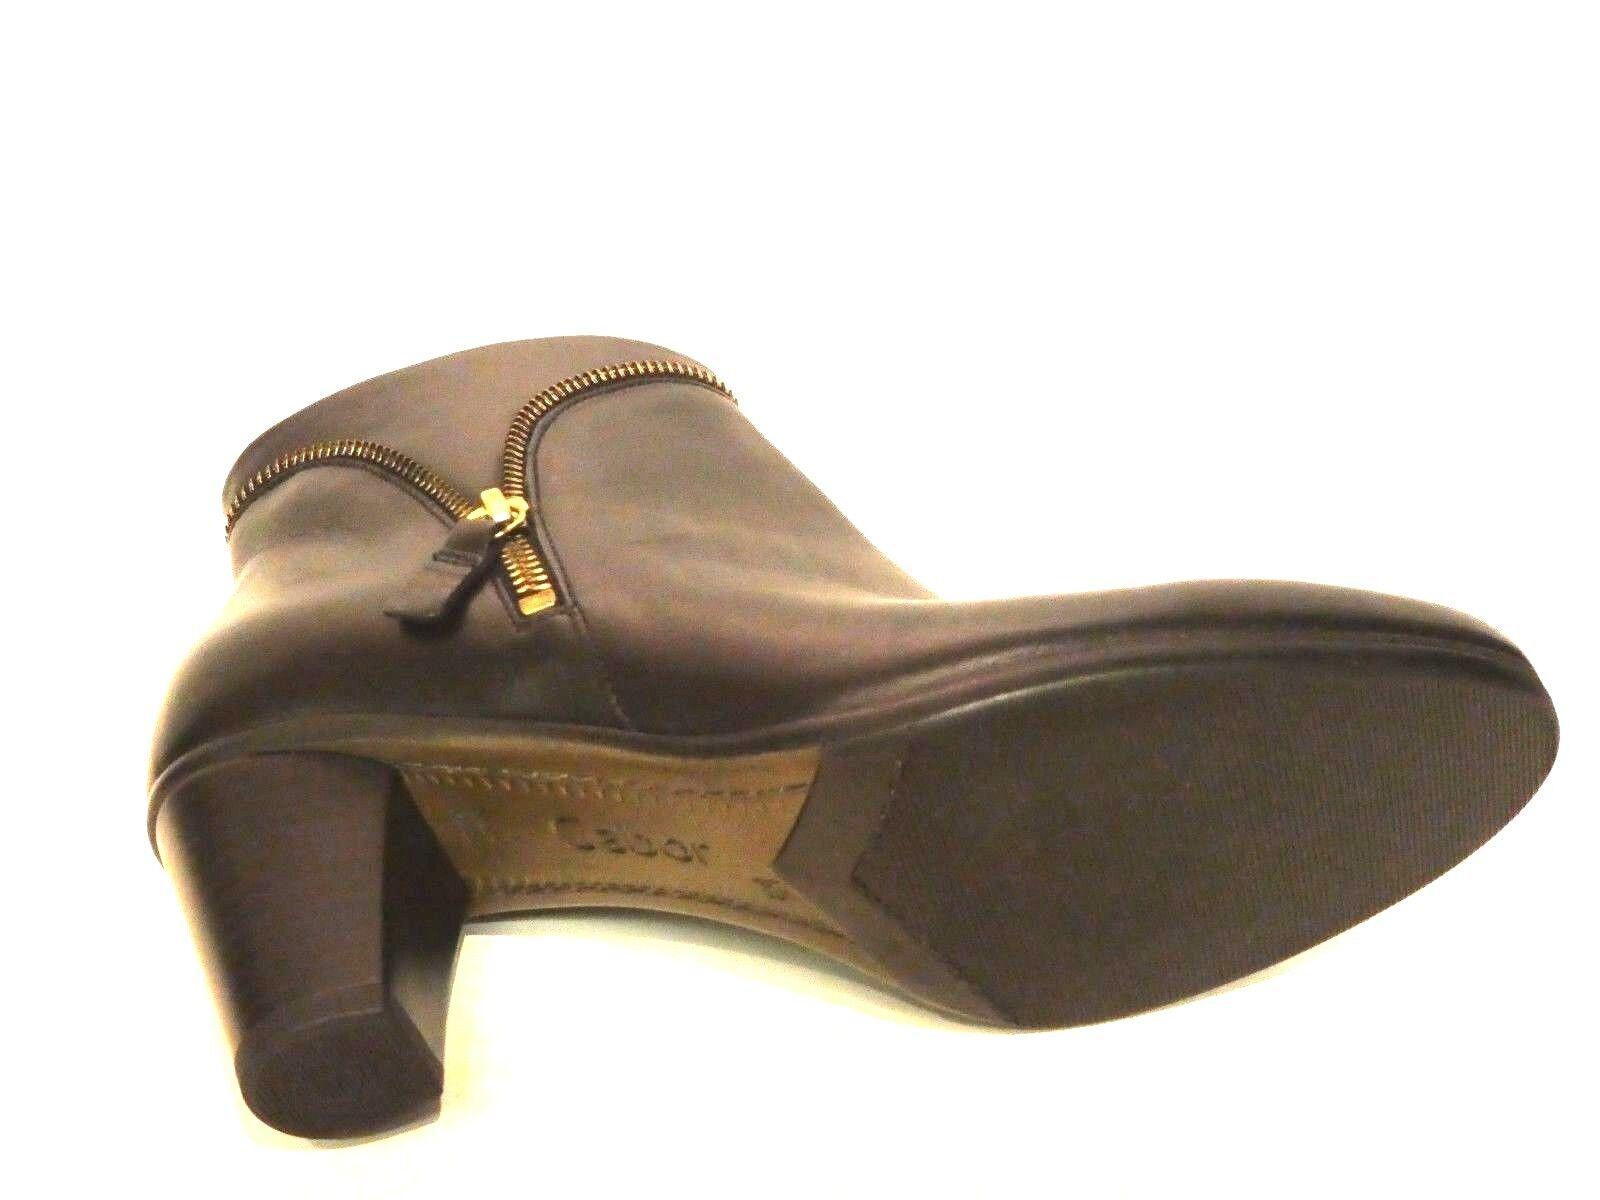 Gabor Schuhe Stiefel Stiefeletten Ankle Stiefel schwarz Leder Leder Leder modisch Gr. 37,5 d3e335